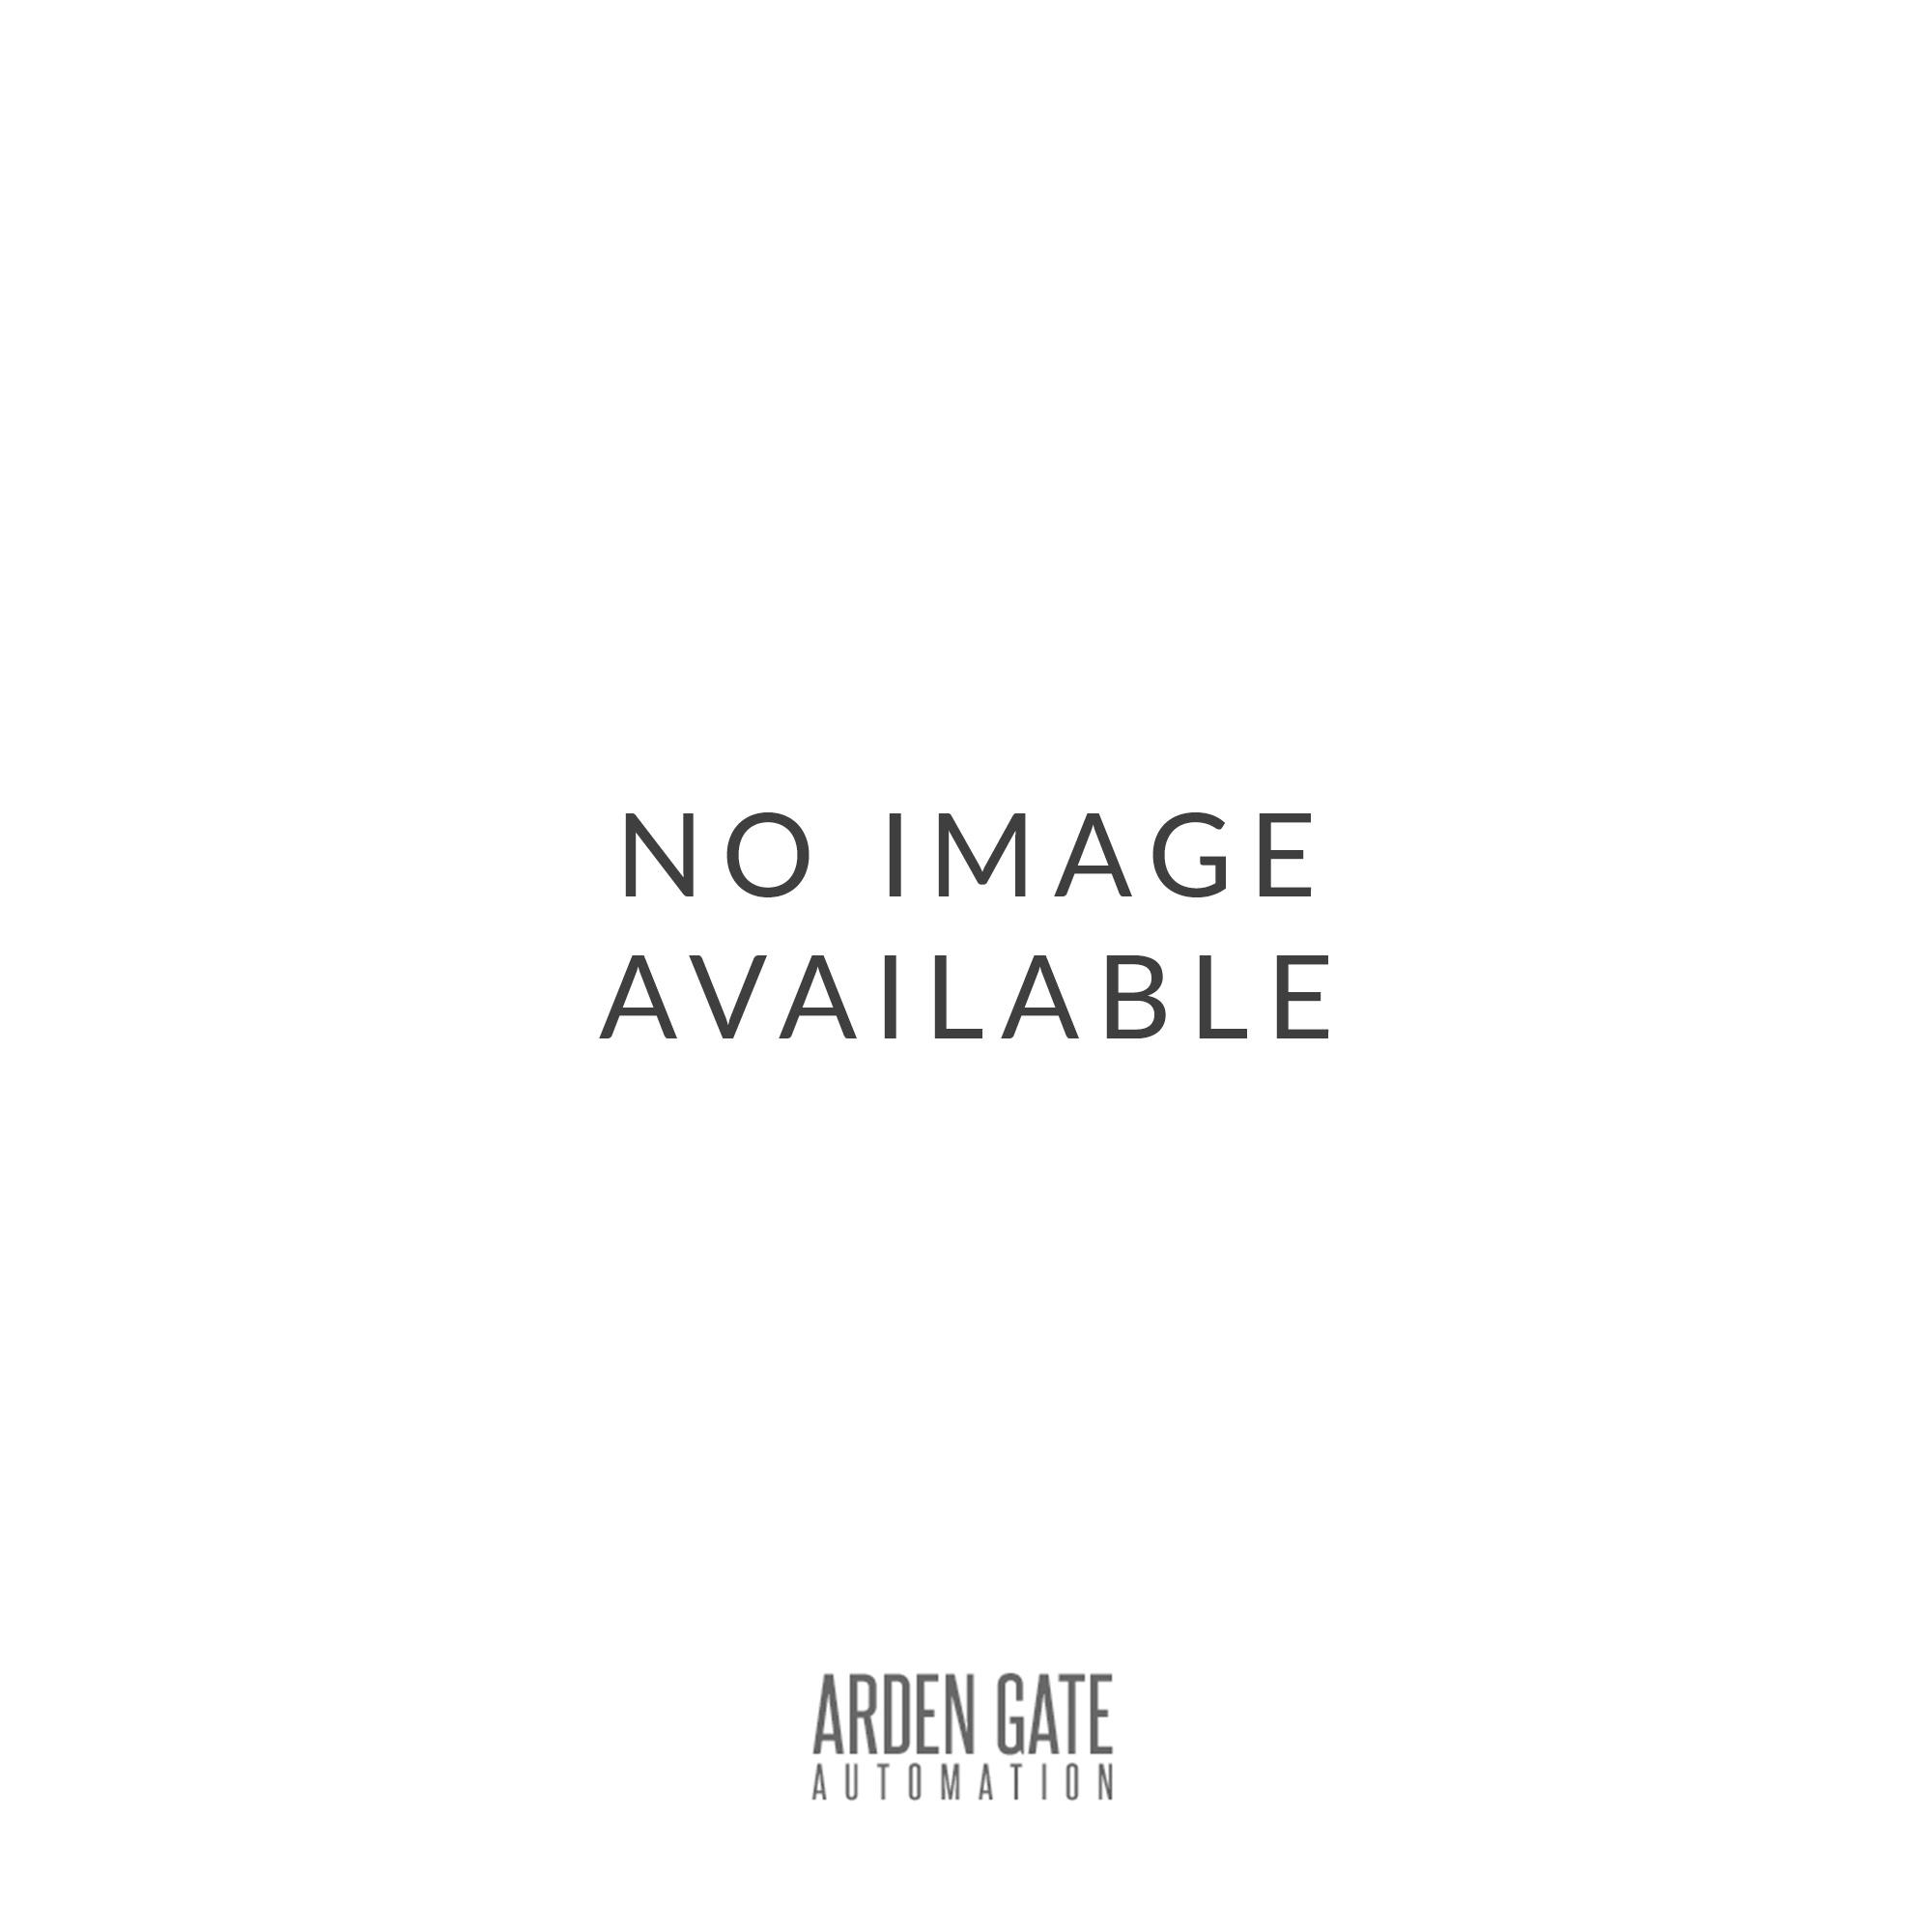 CAME keypad digital selectors, surface-mounted keypad